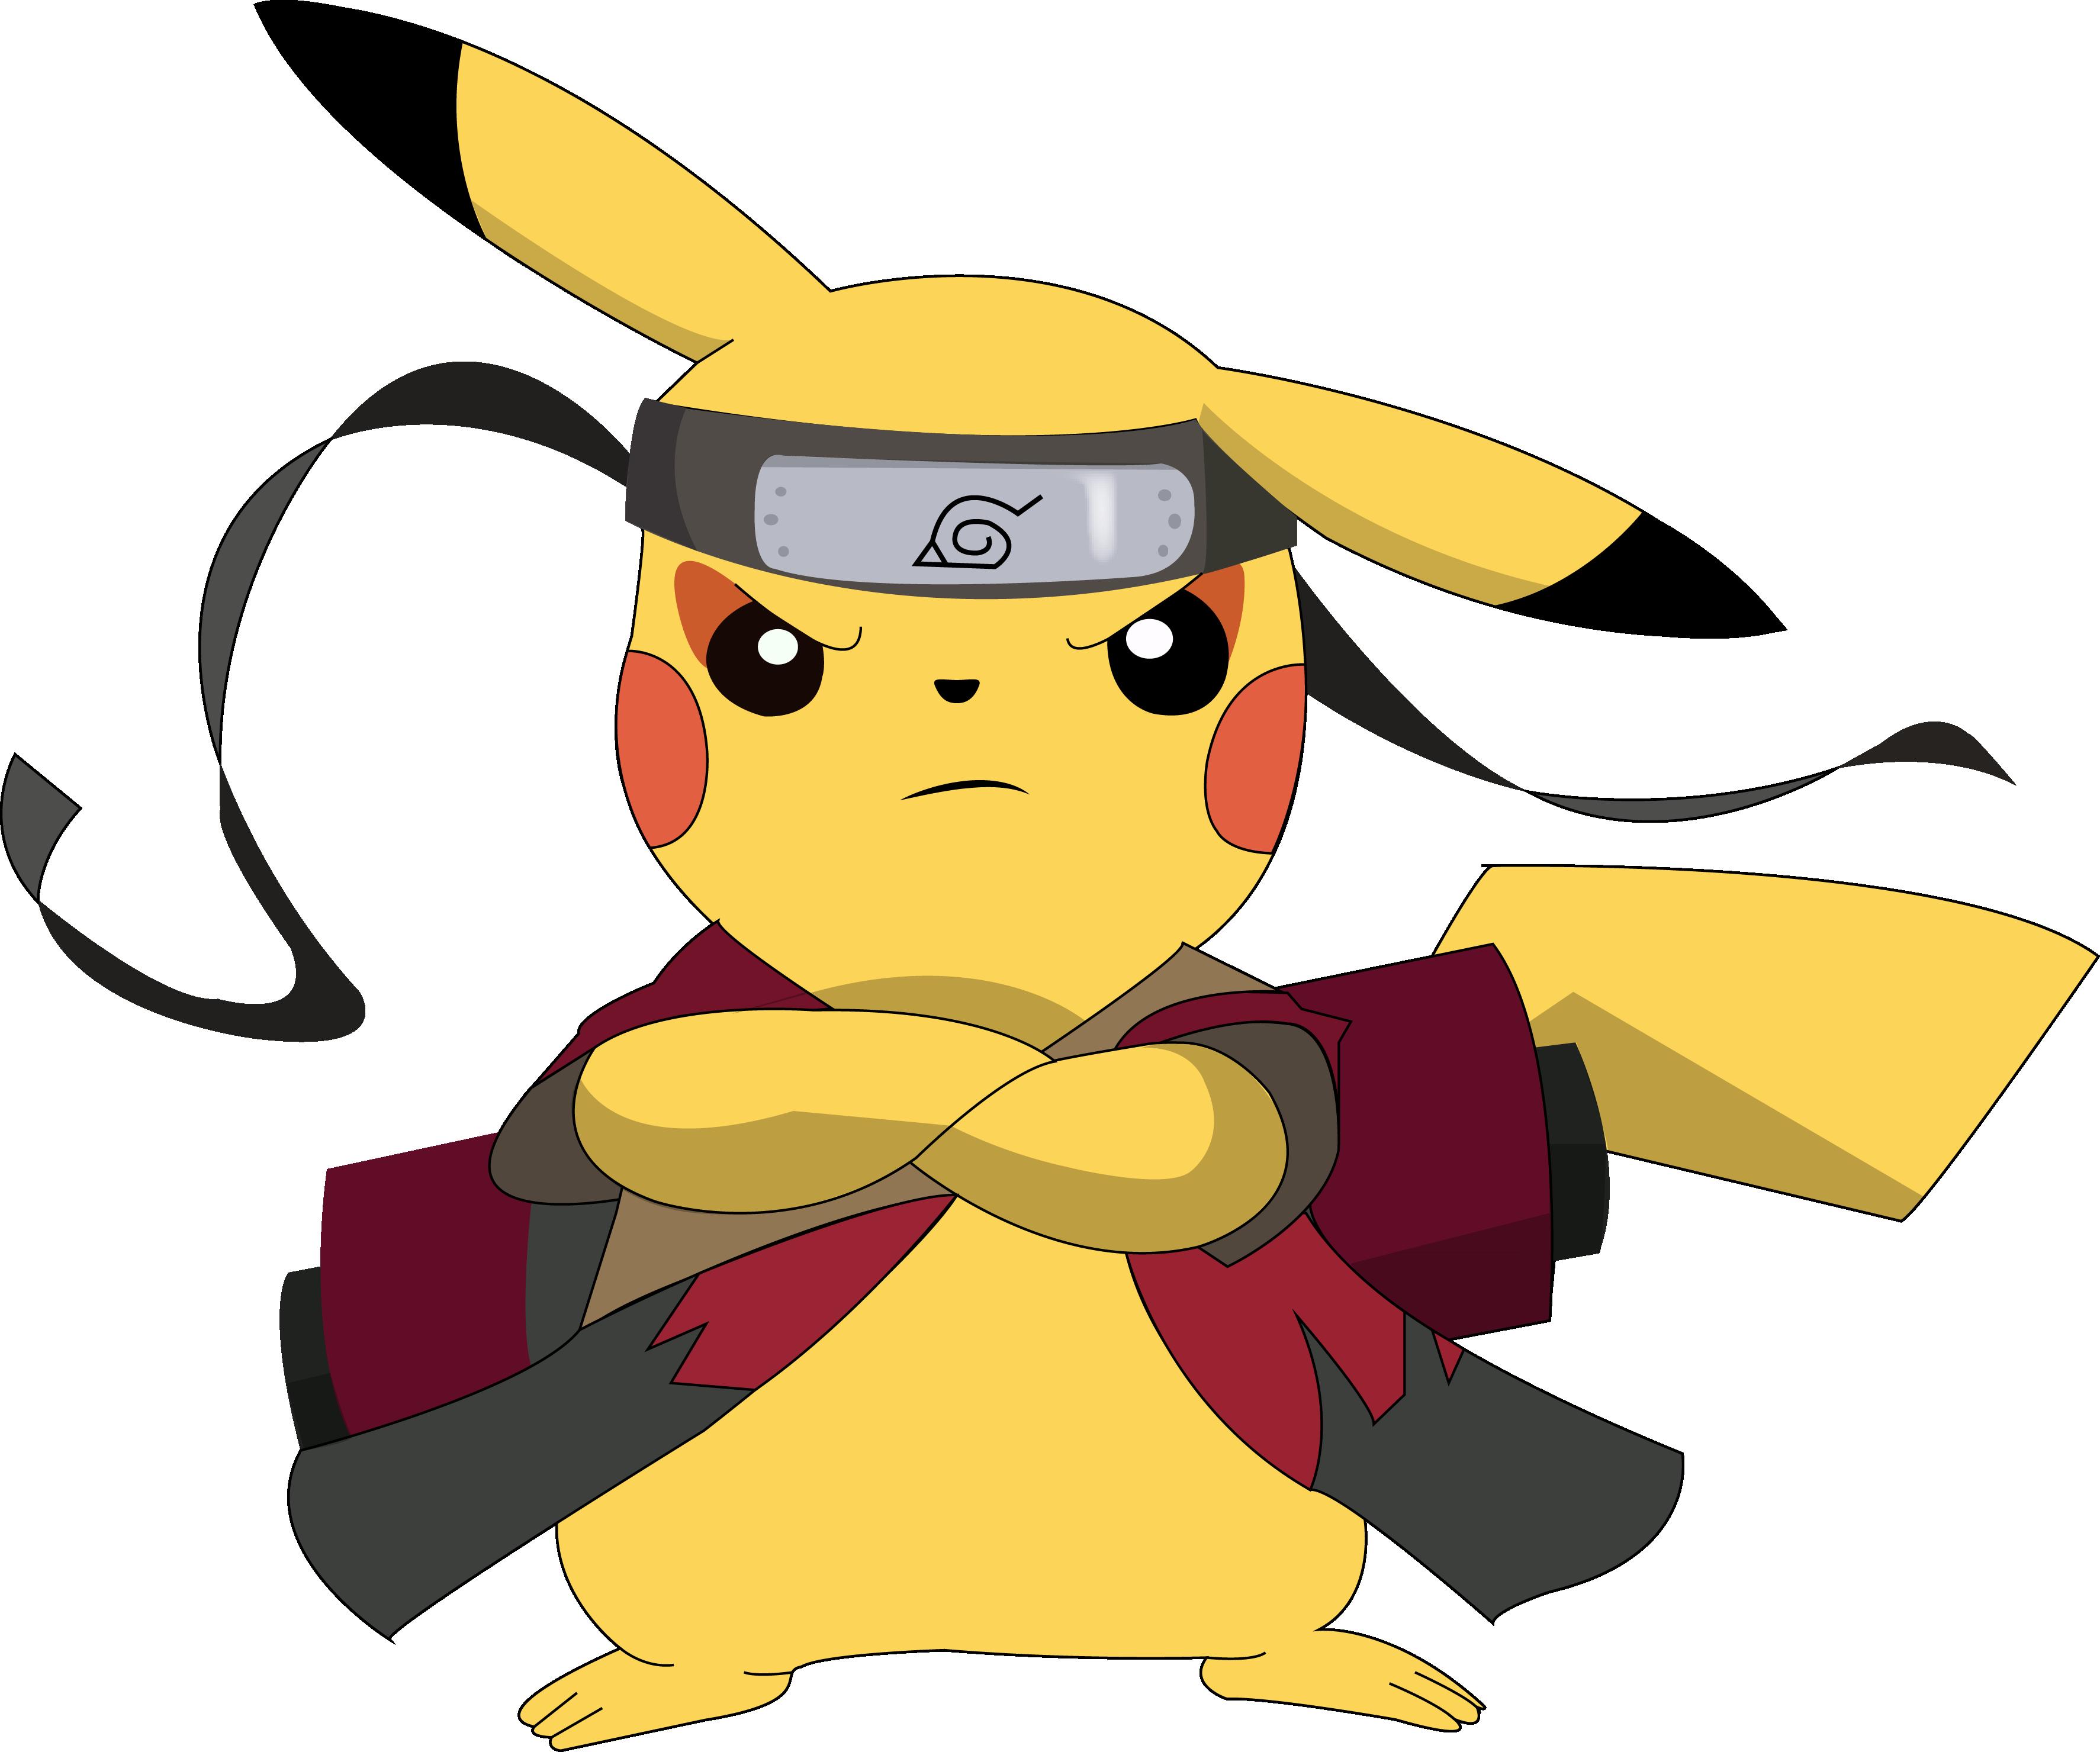 39 - Pikachu dessin anime ...